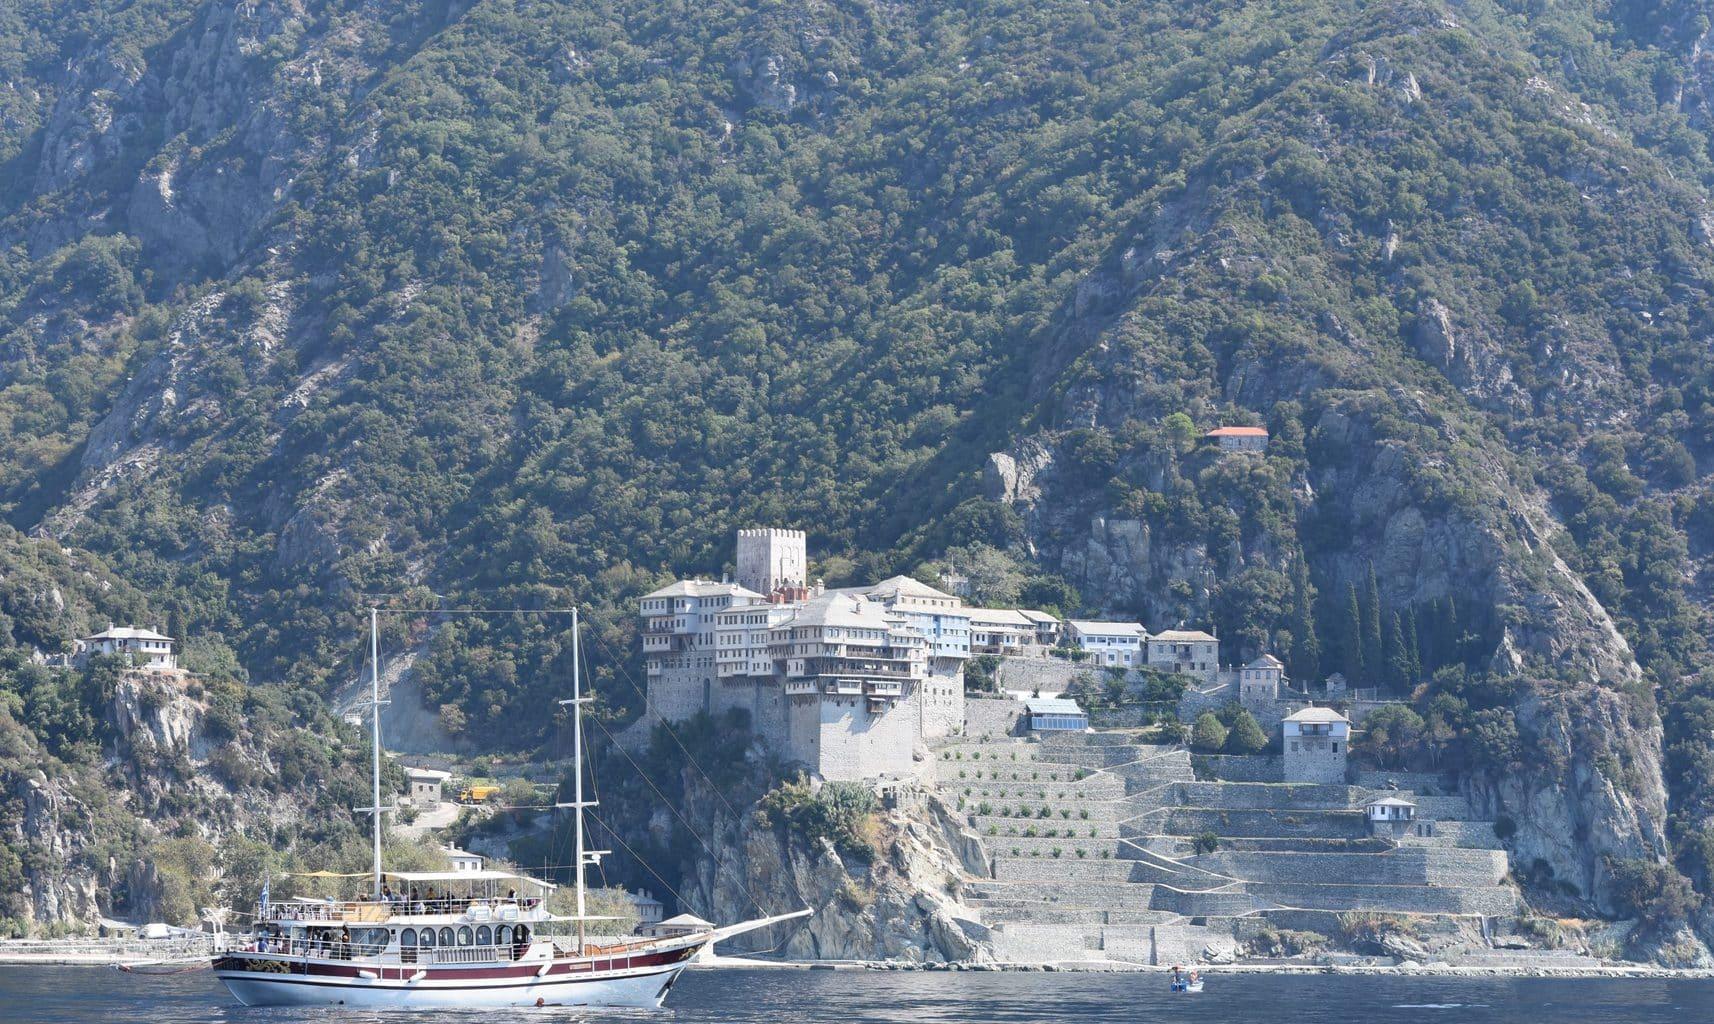 ormos panagias to mount athos cruise 2